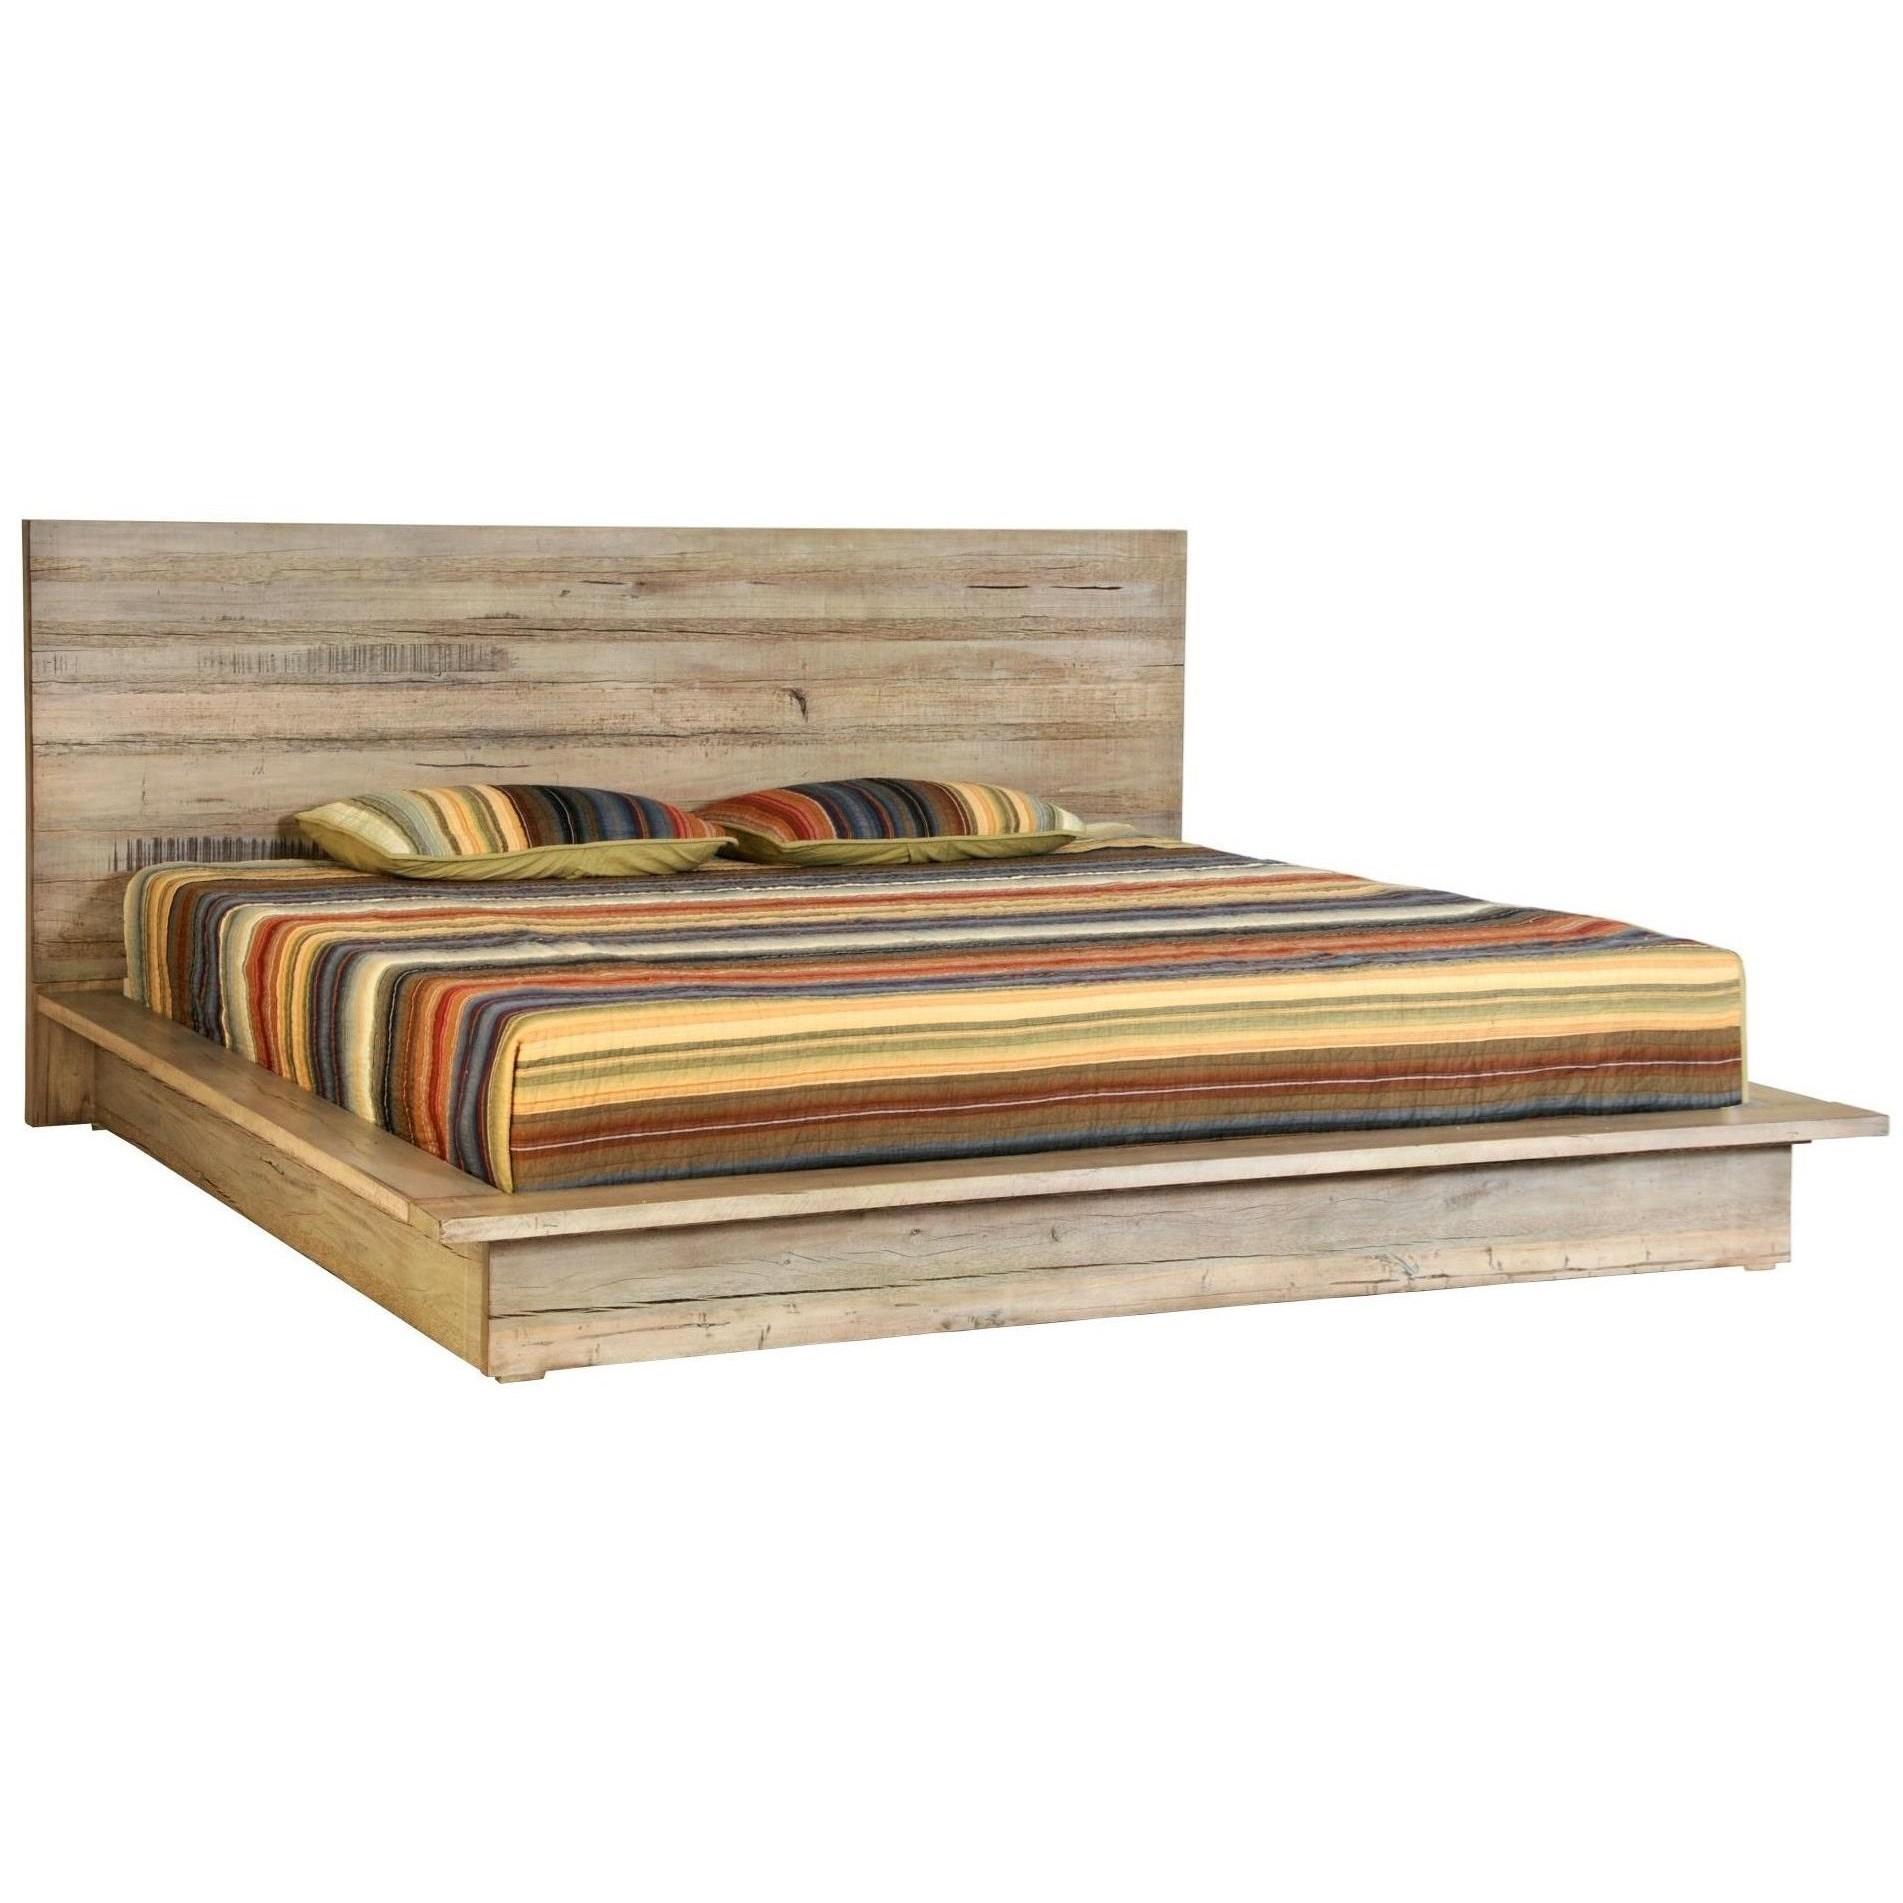 Merveilleux Napa Furniture Designs Renewal Queen Low Profile Bed